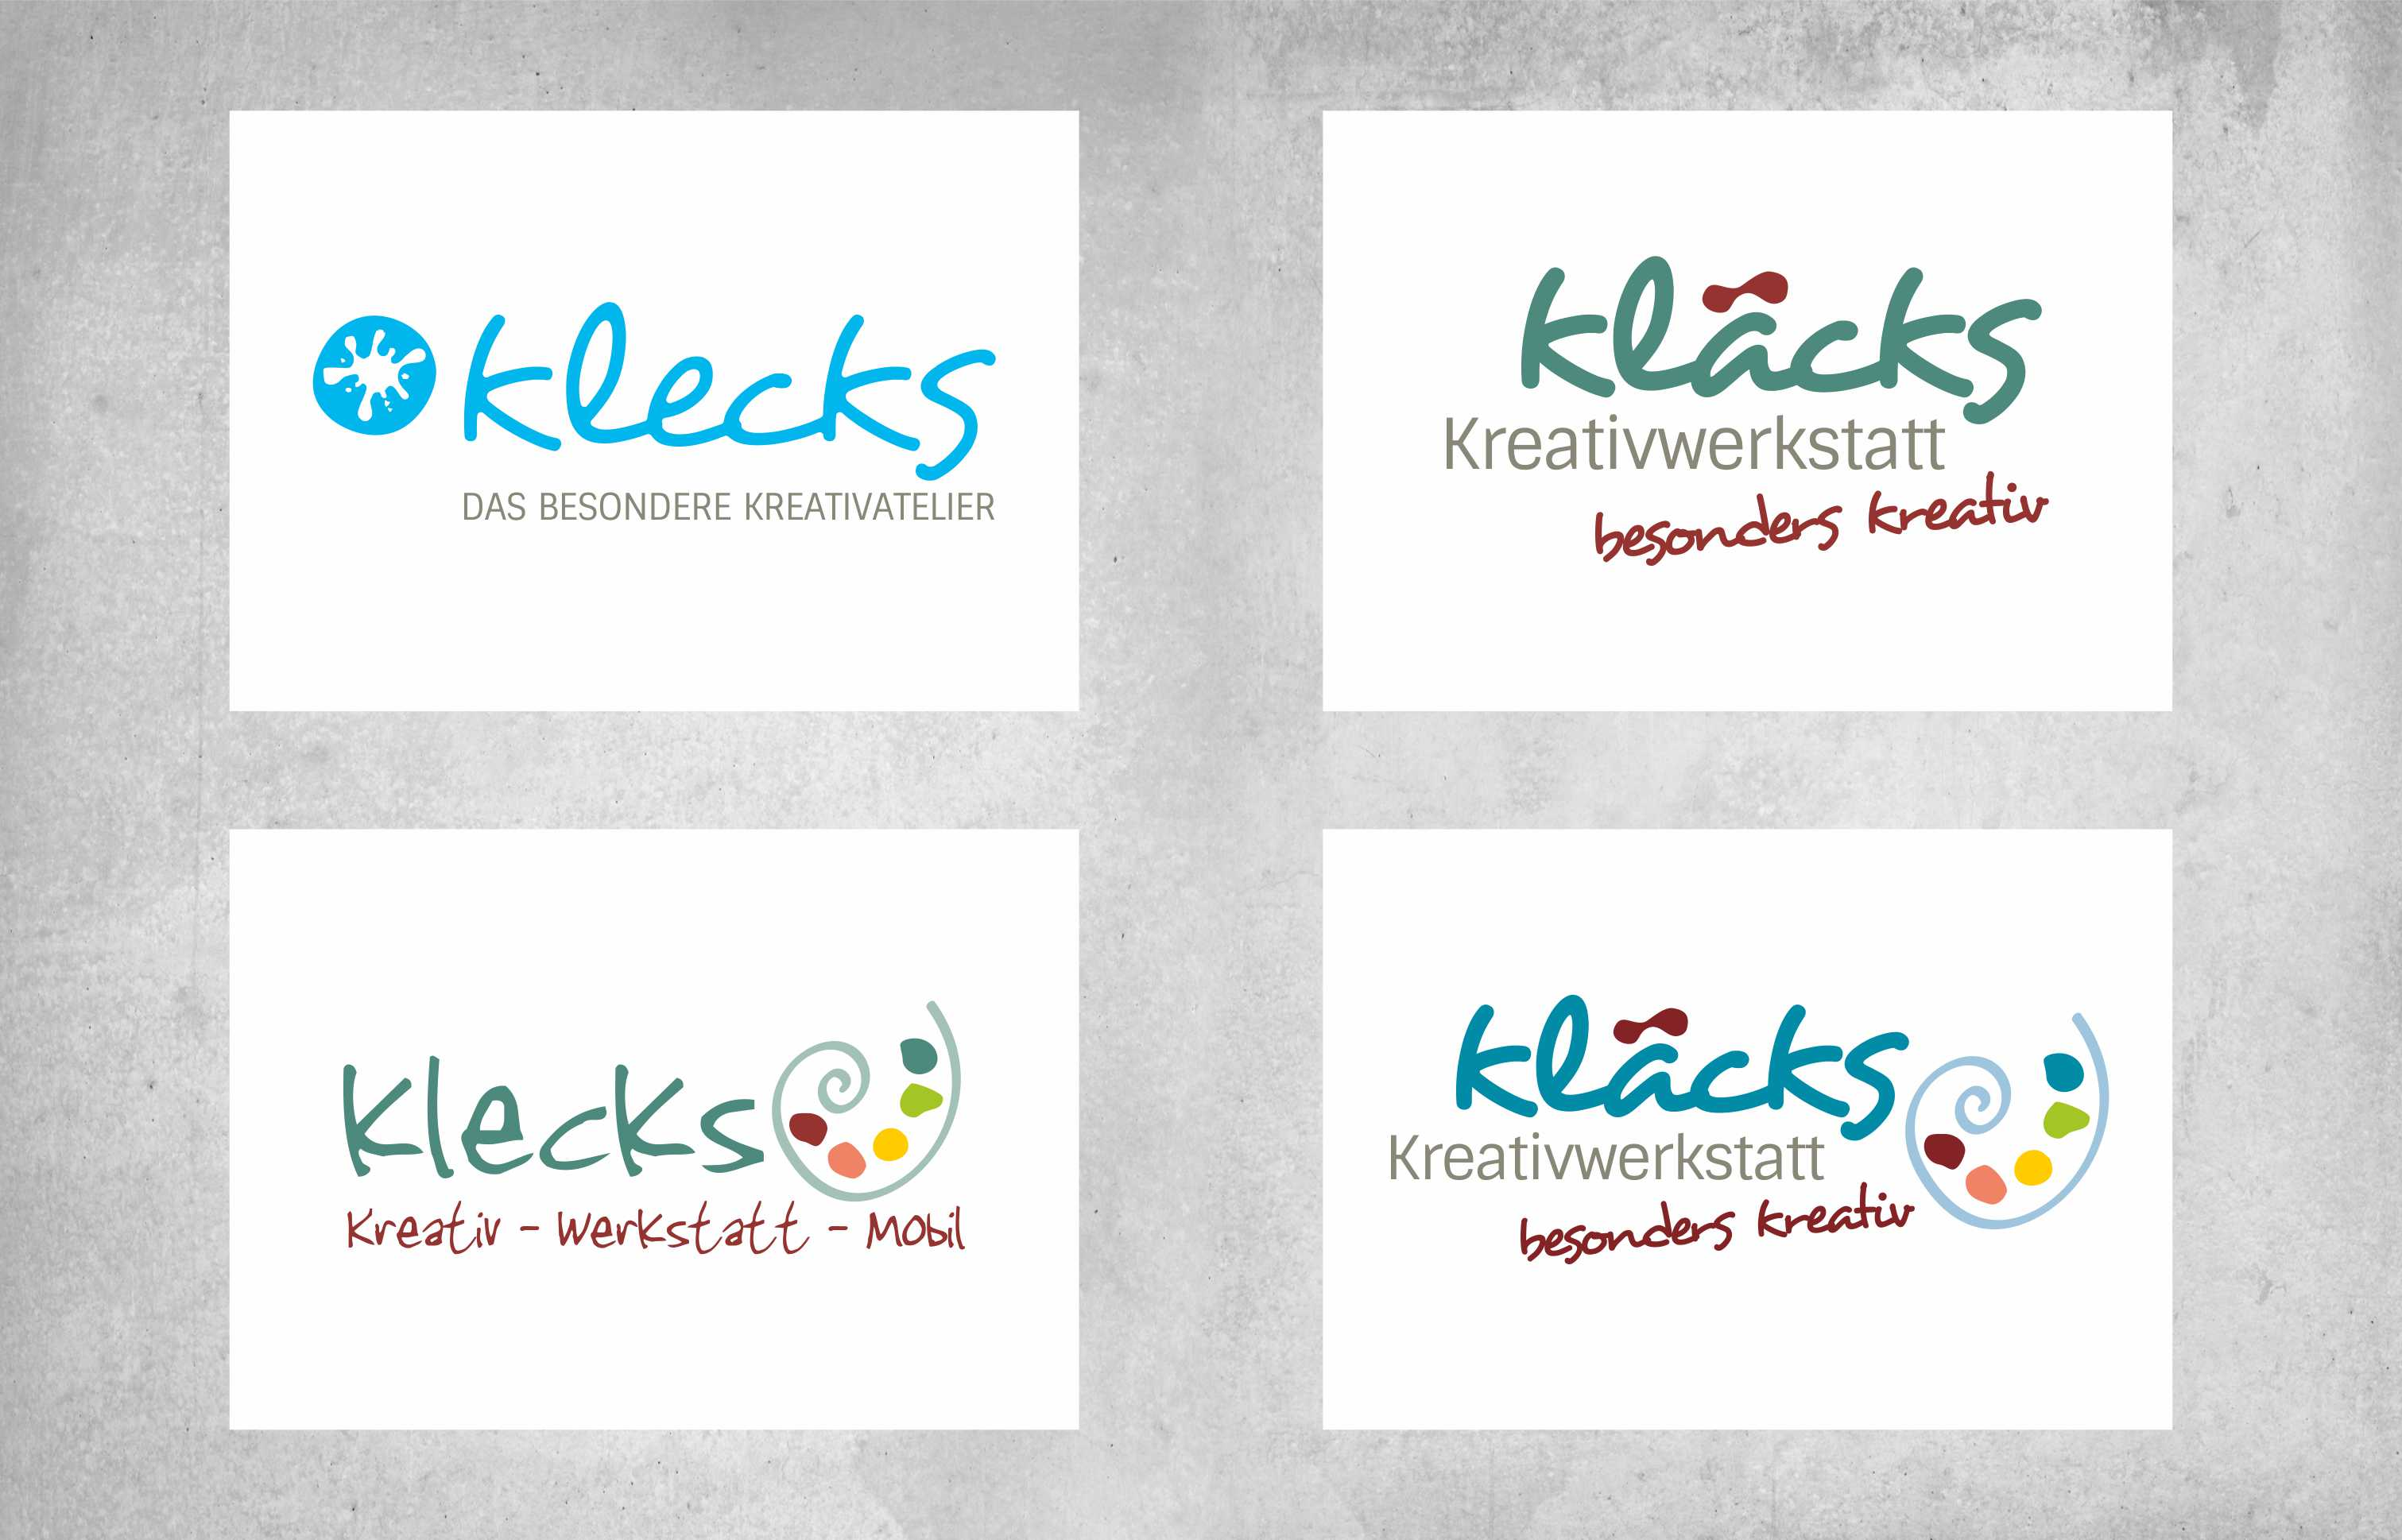 Logodesign kläcks Entwürfe all2design Laura Friedrich